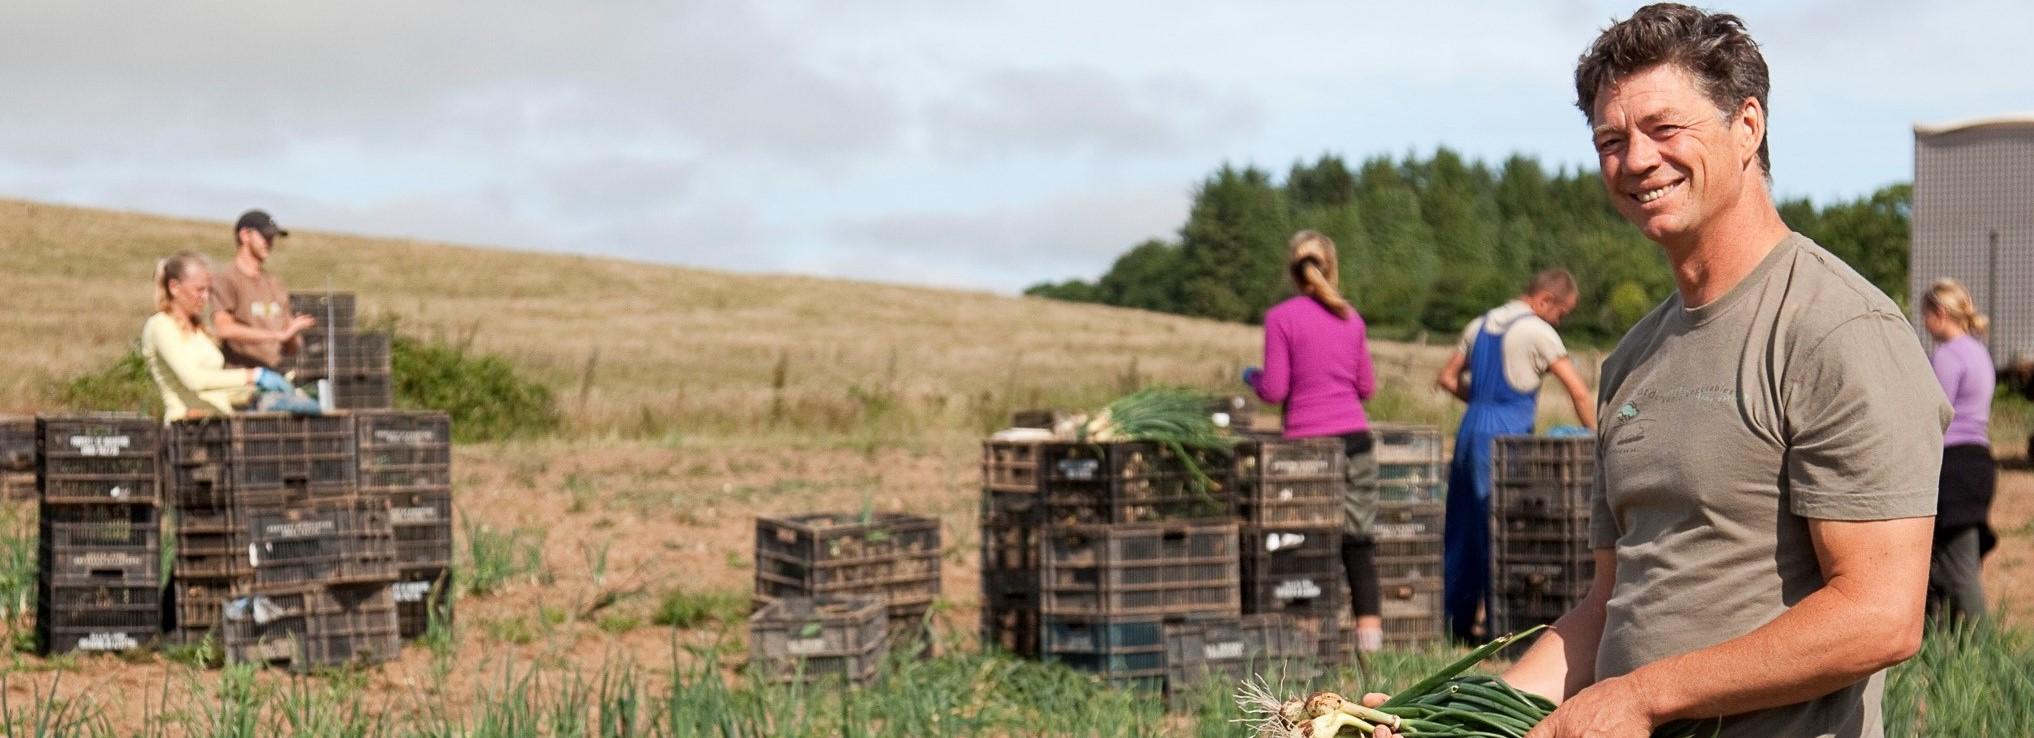 Working at Riverford Farm